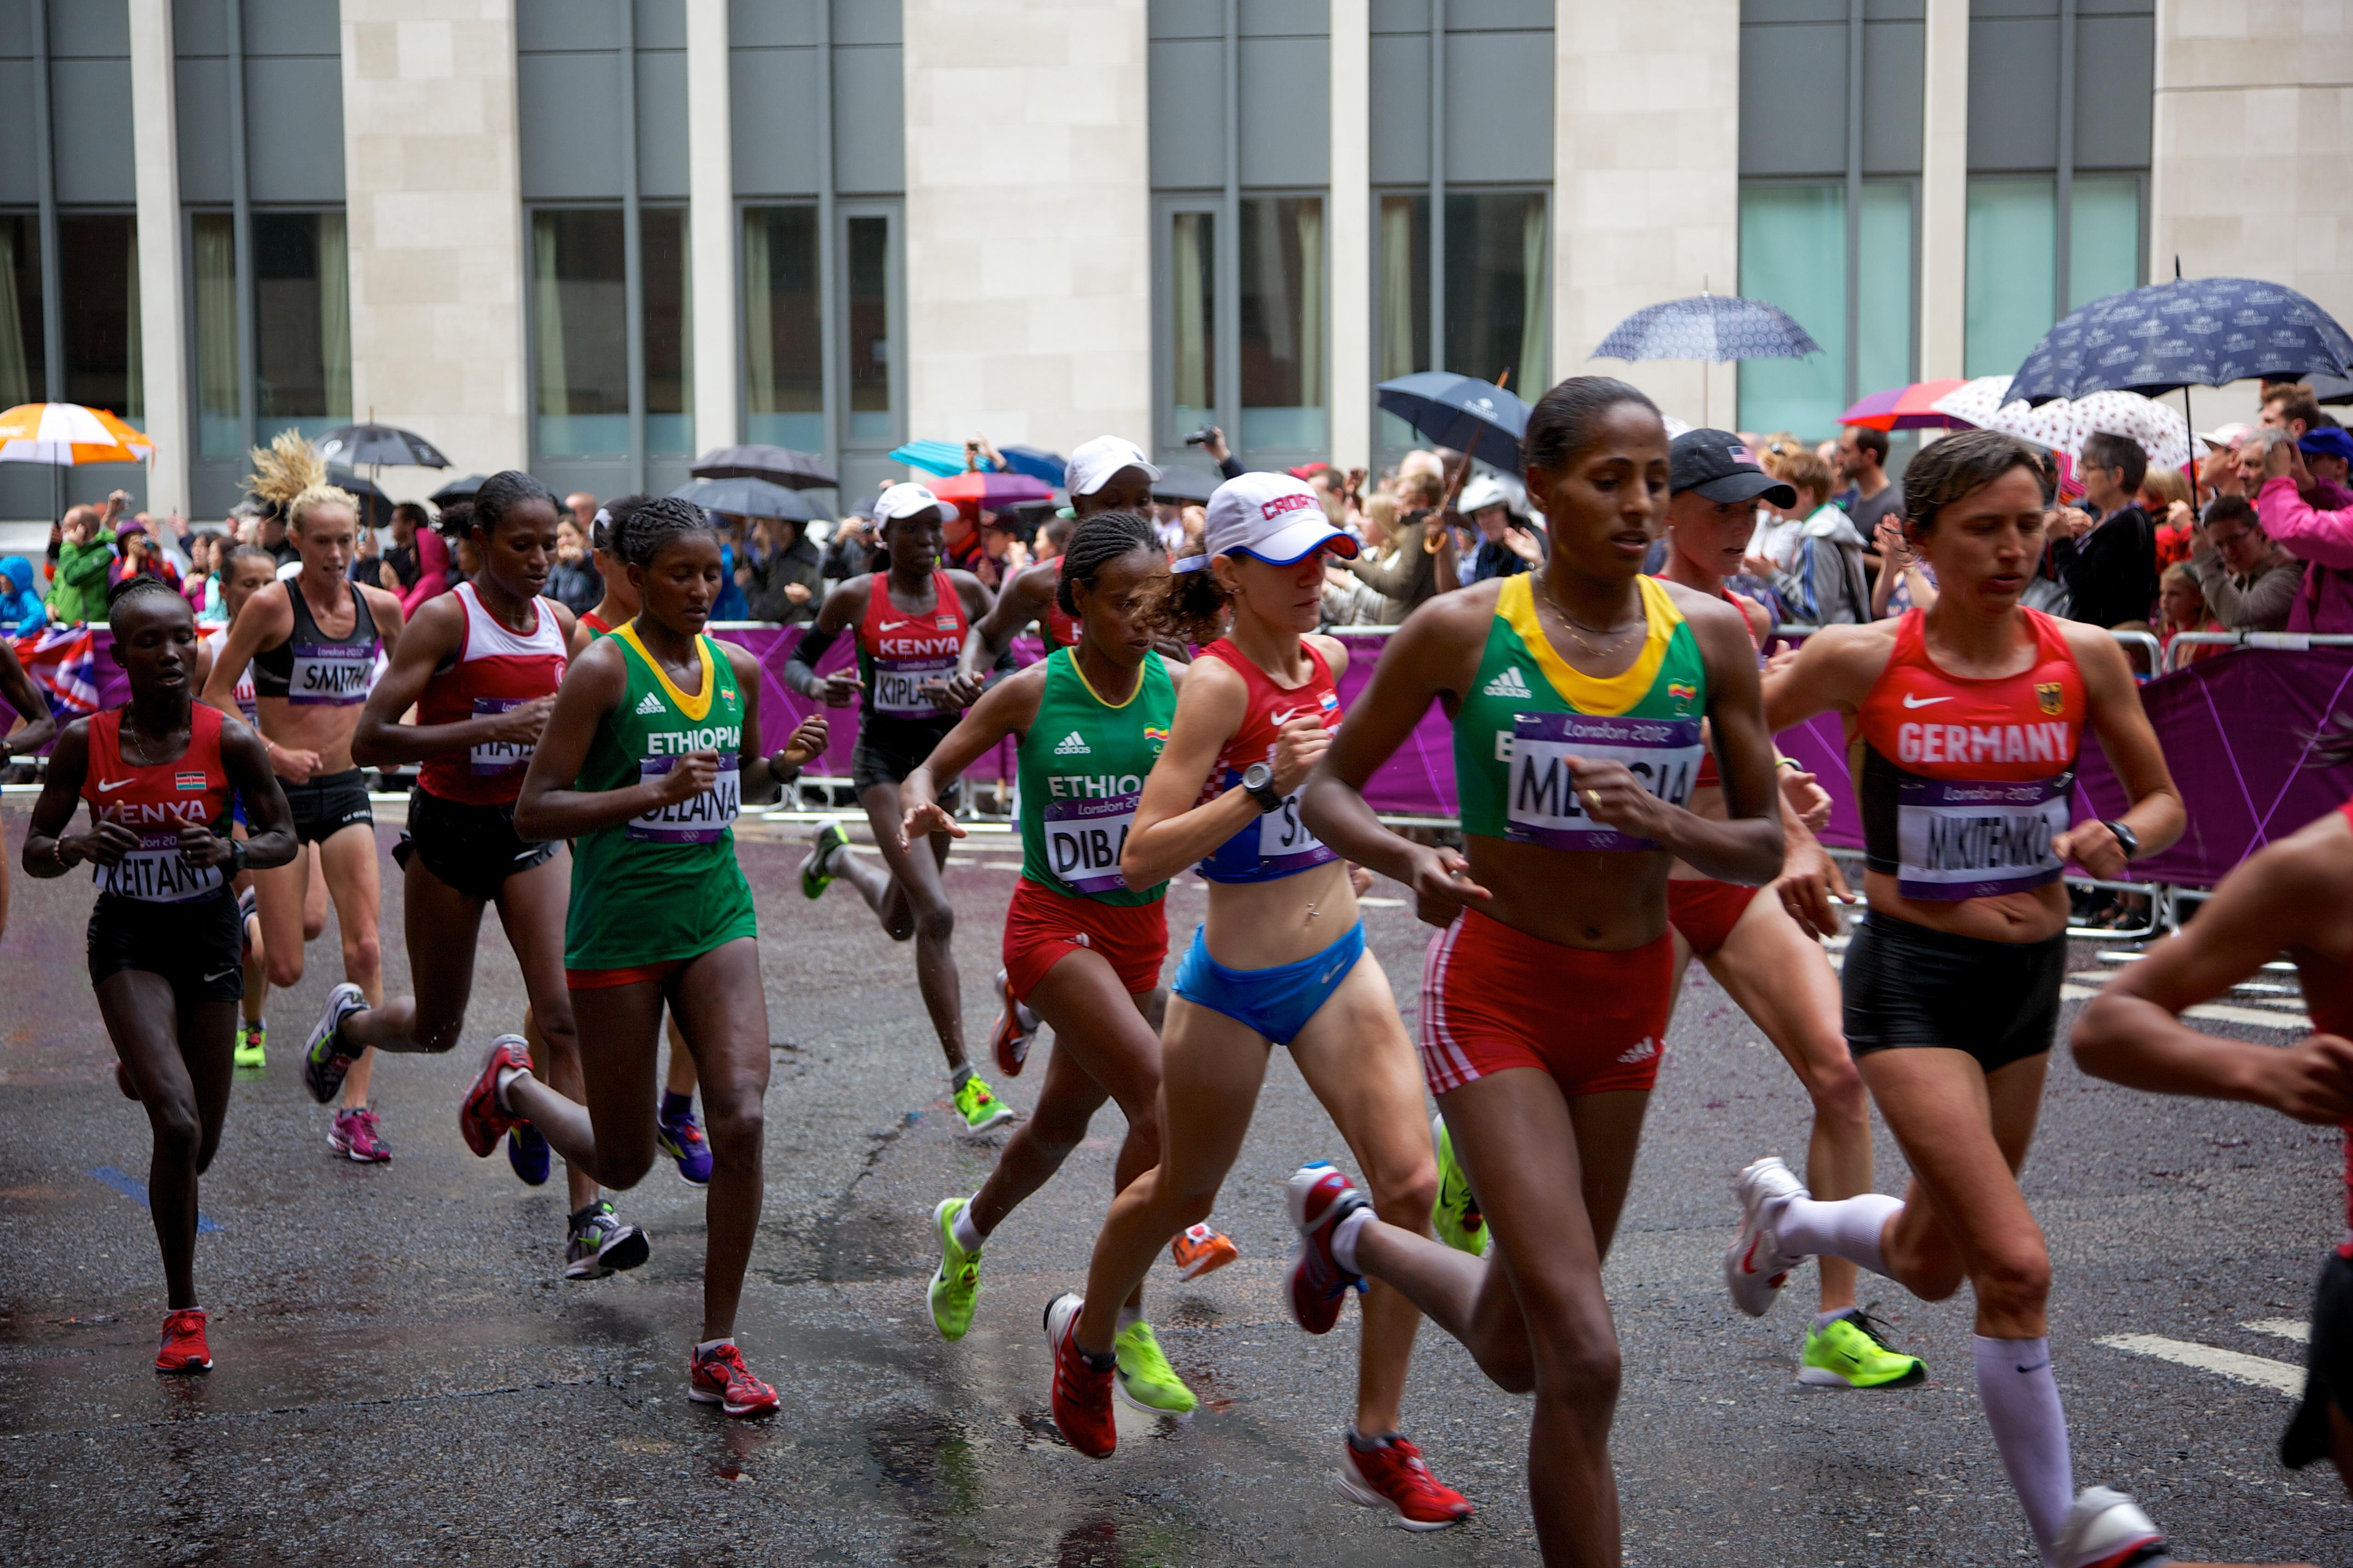 9fda430319 Athletics at the 2012 Summer Olympics – Women's marathon - Wikipedia